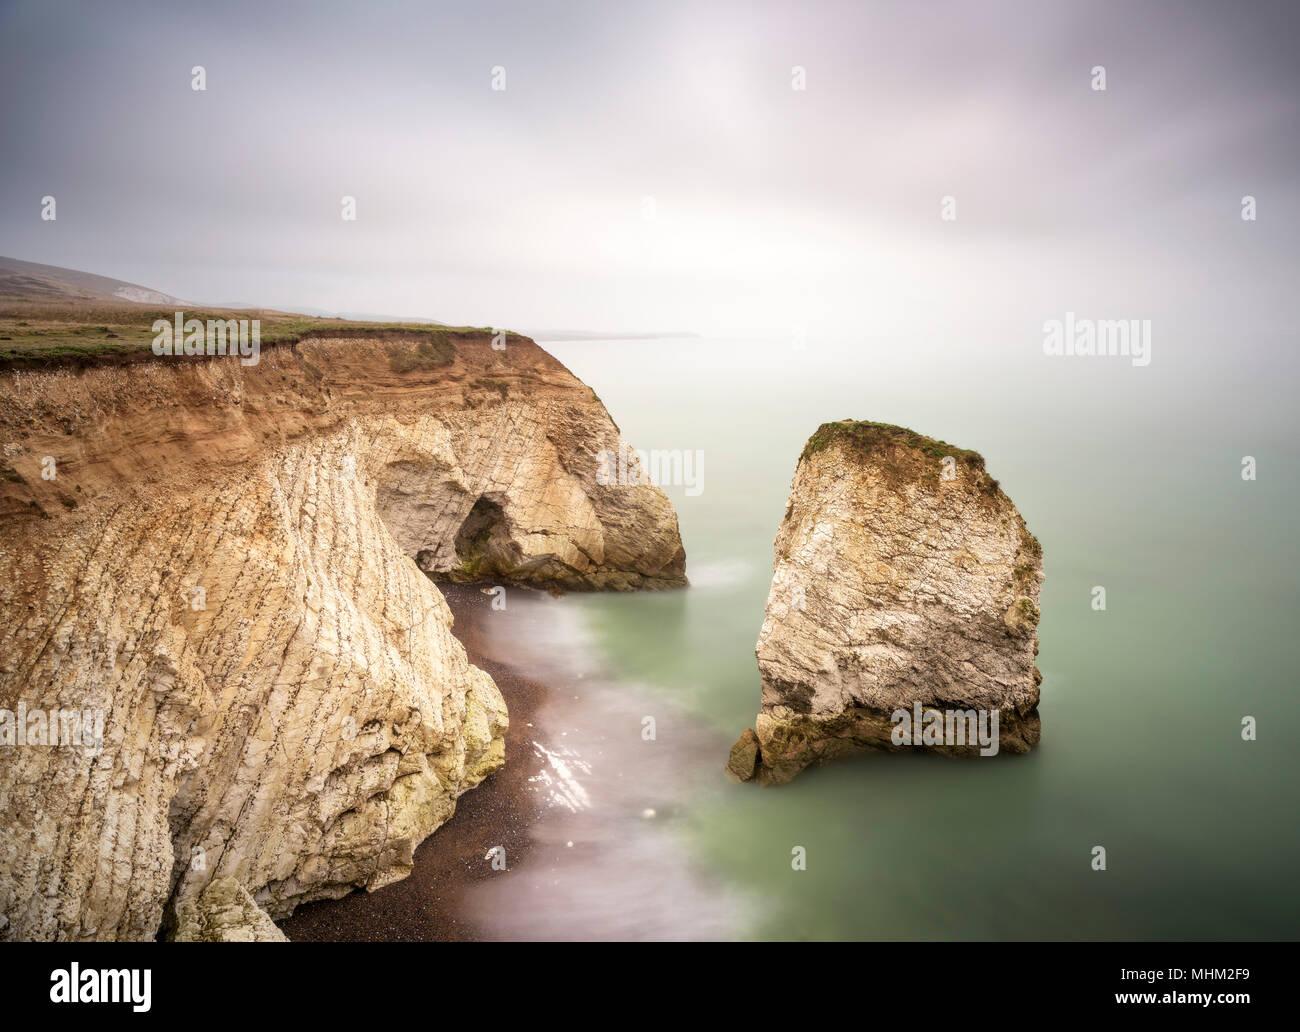 Neblig Küsten an den Klippen am Meer, lange Belichtung Stockbild